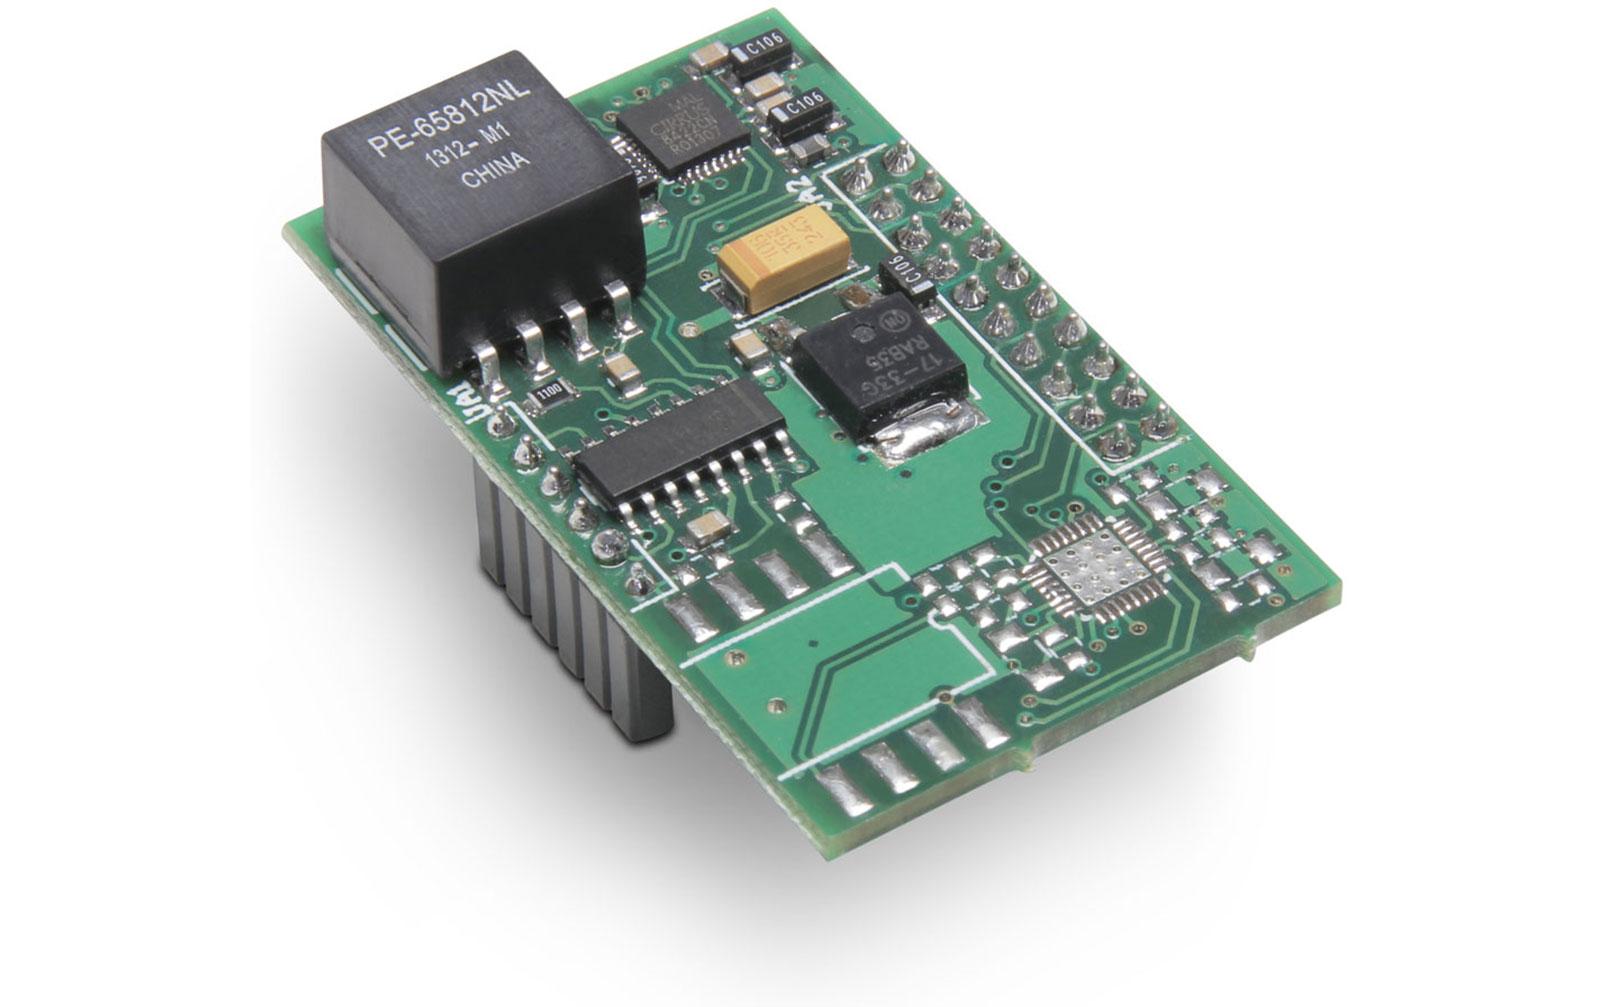 ram-audio-aes-322-aes-ebu-digitaler-eingang-fa-r-ramdsp22w